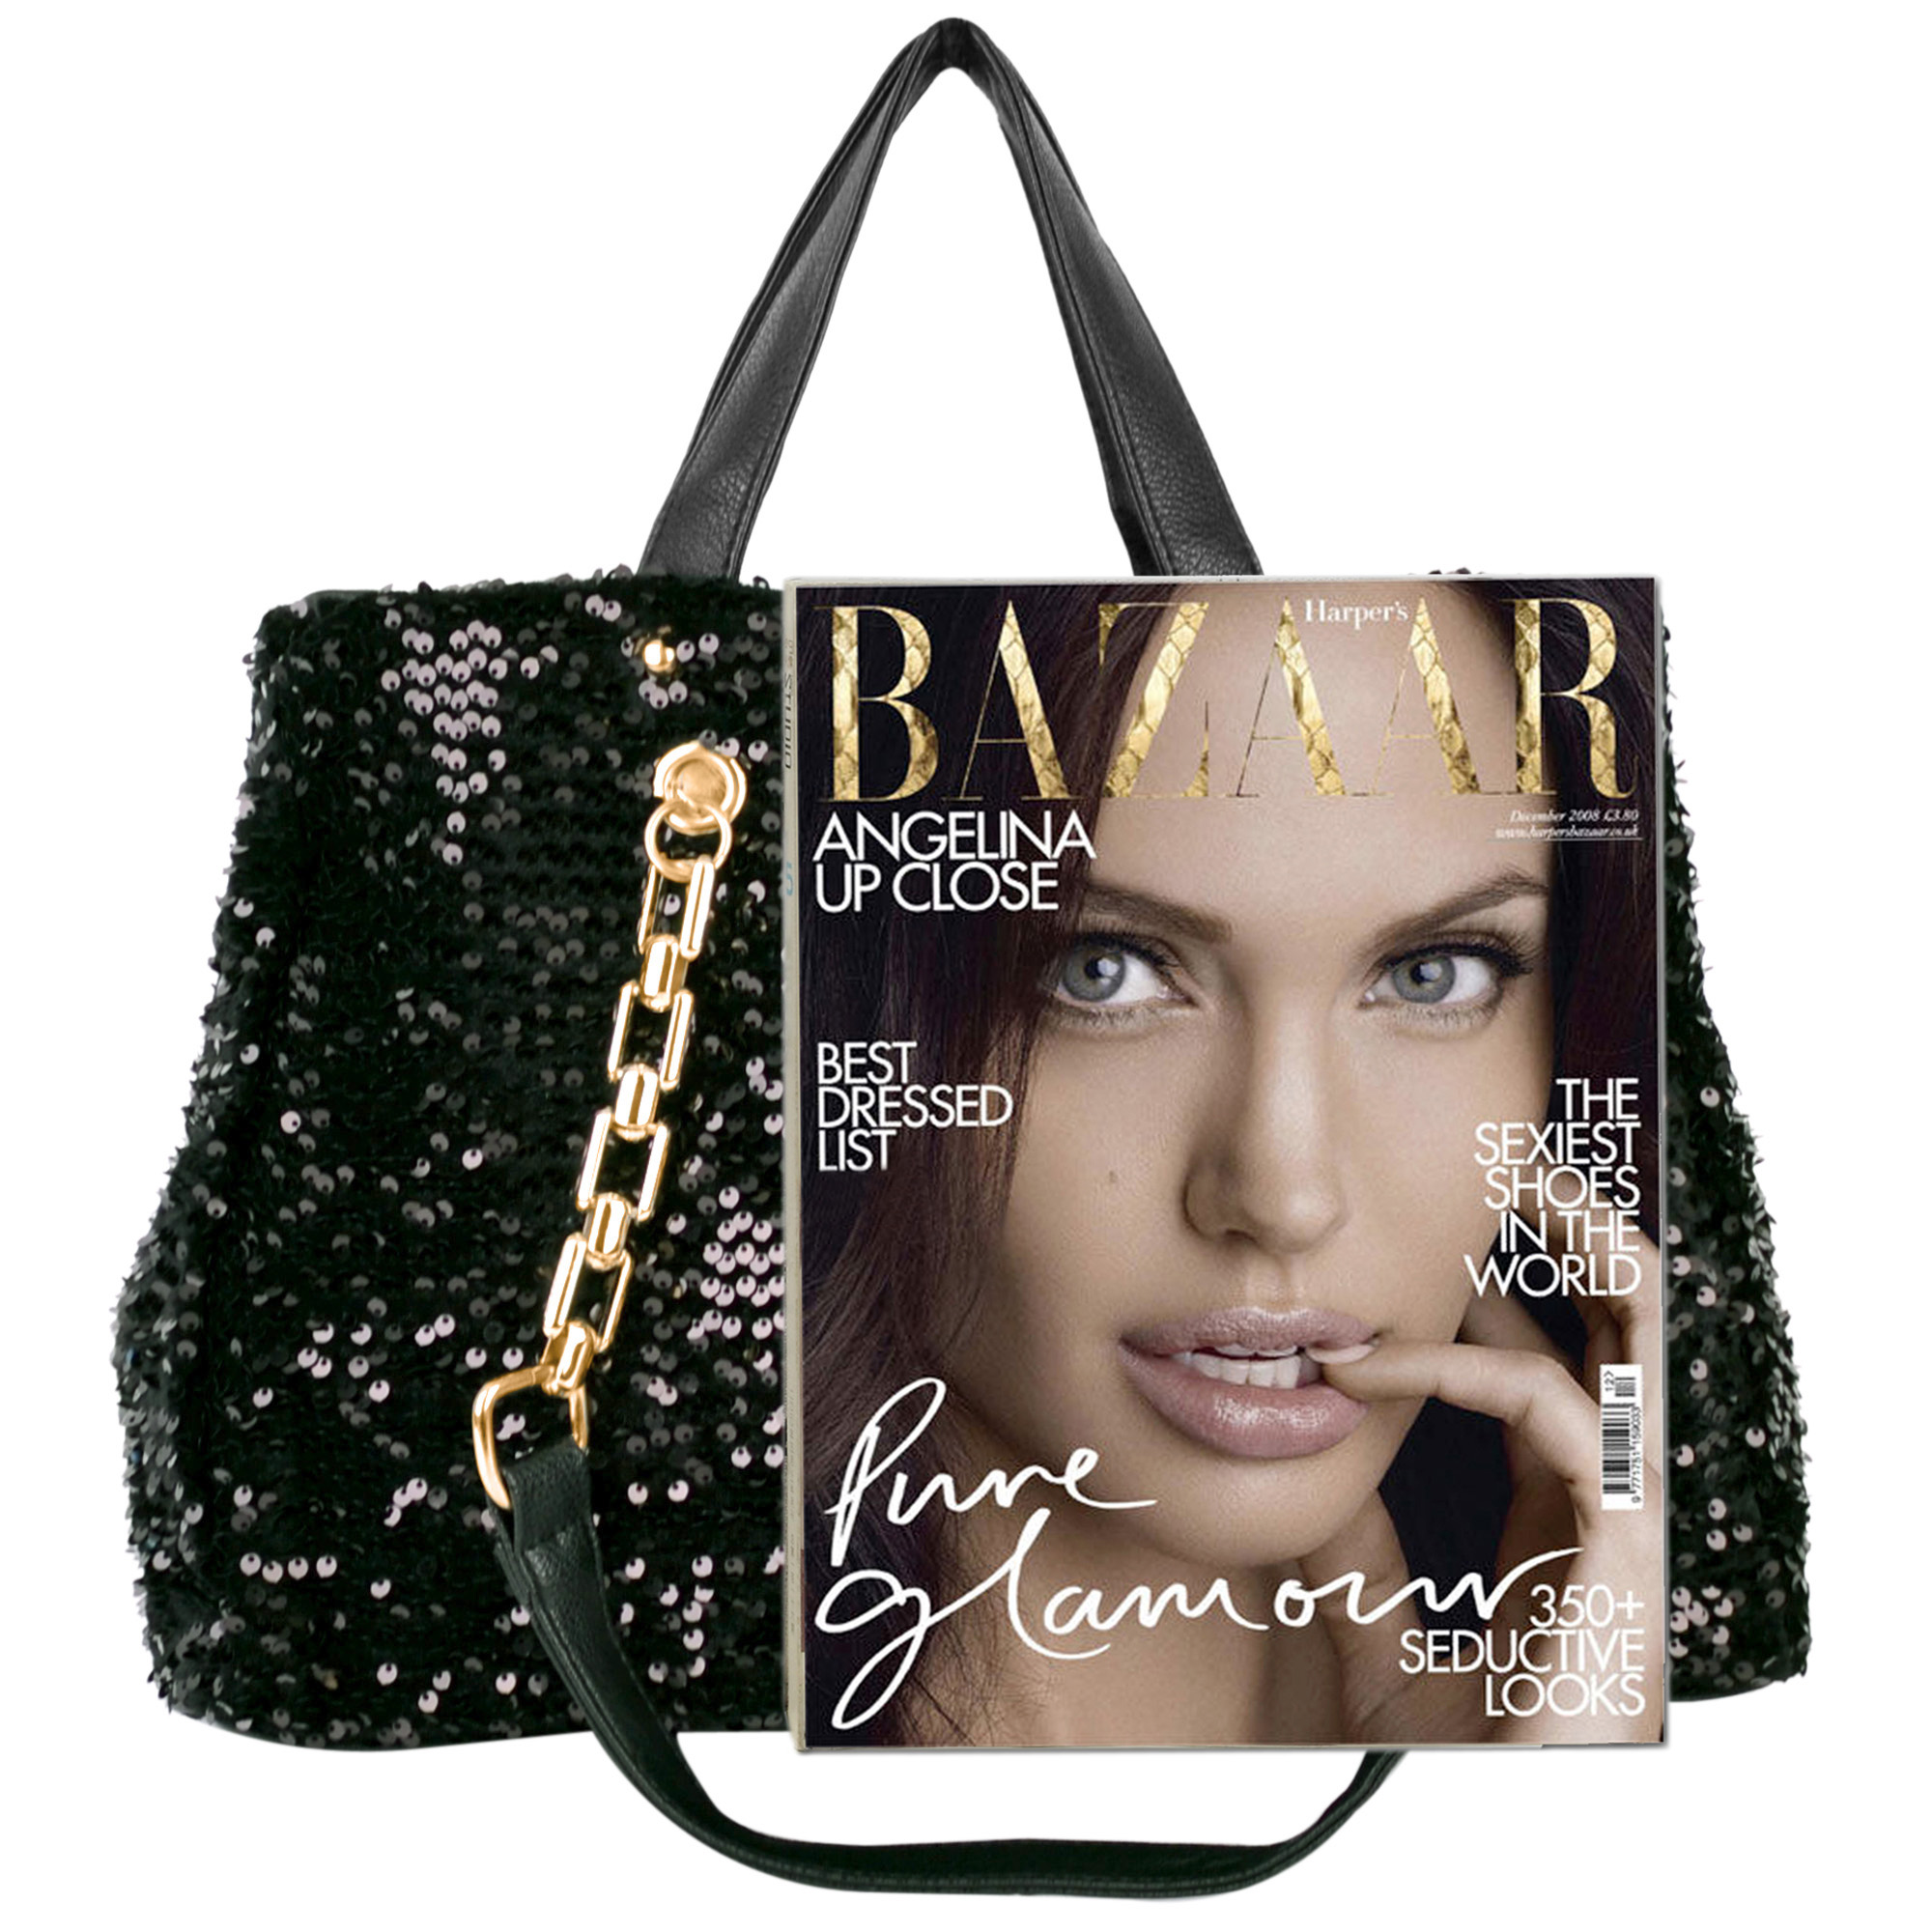 Noelia black sequined handbag size comparison image